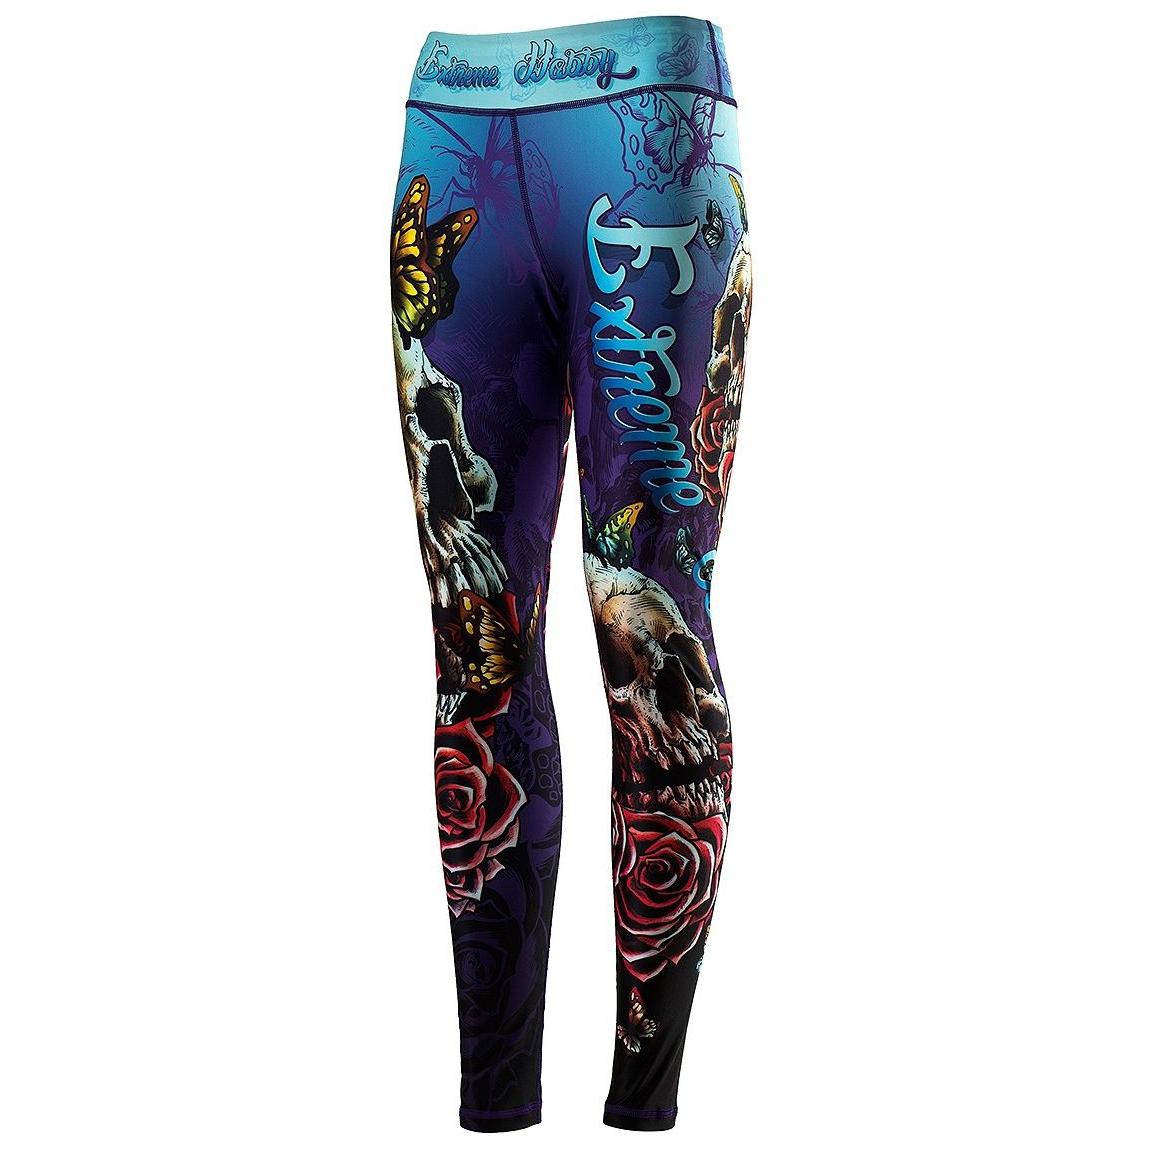 Spodnie do biegania